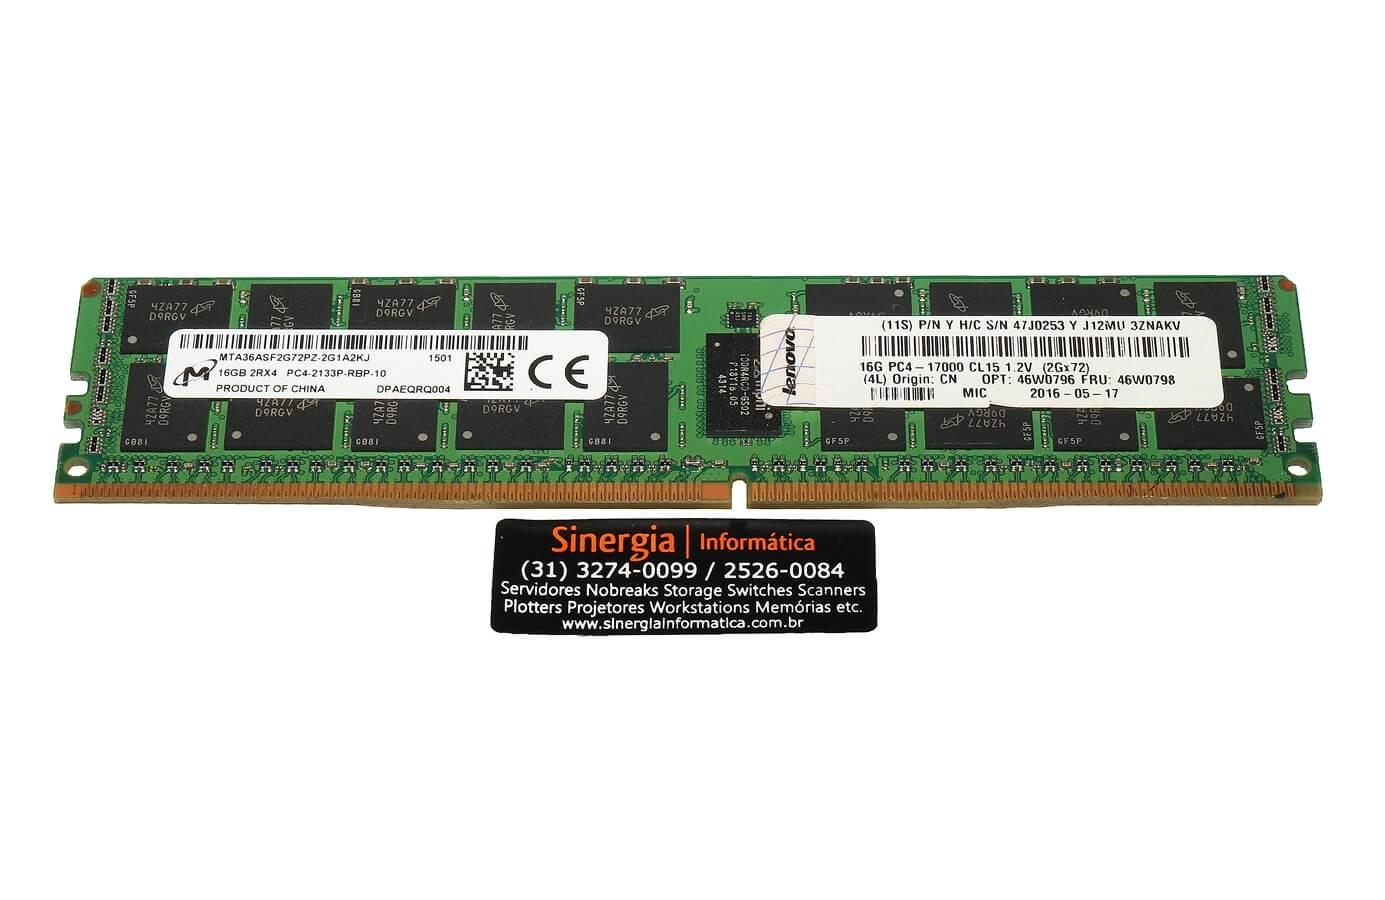 47J0253 Memória Lenovo 16GB DDR4 2133MHz ECC Registrada Servidor Lenovo System X3550 x3650 M5 x3850 x3950 X6 pronta entrega